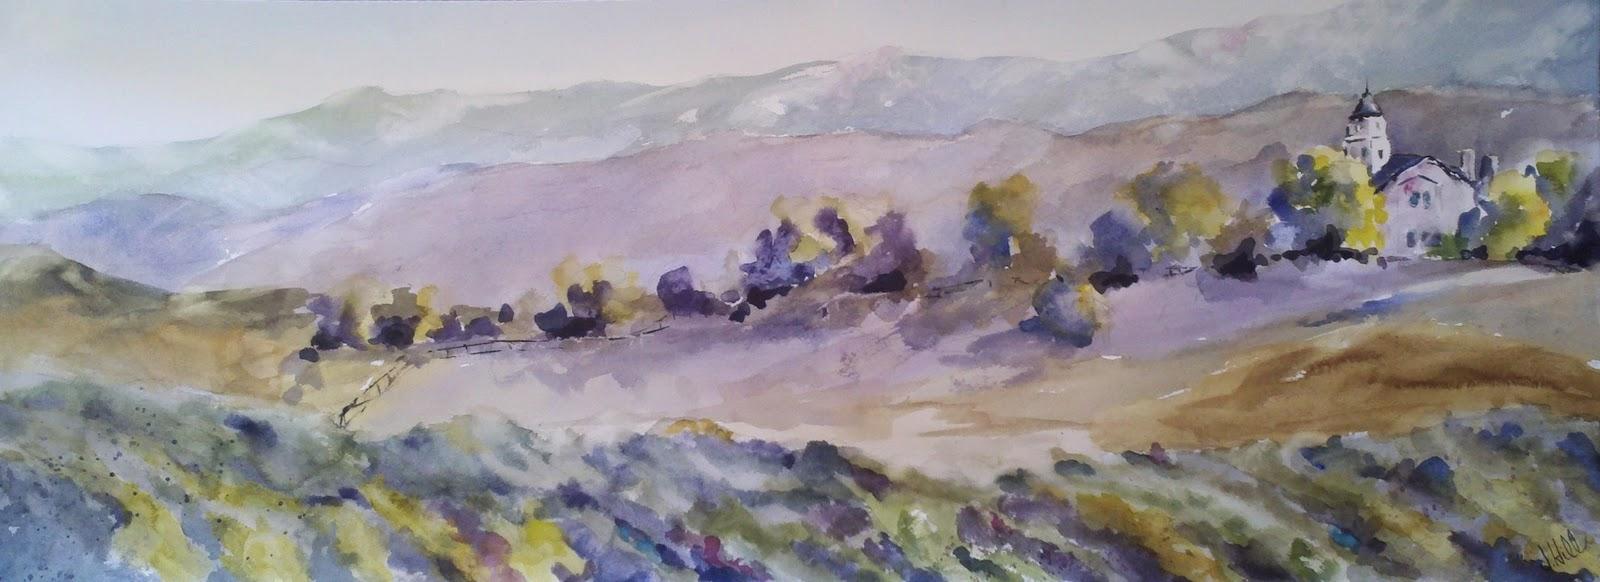 Leoness Vineyard, Temecula original fine art by Julie Hill